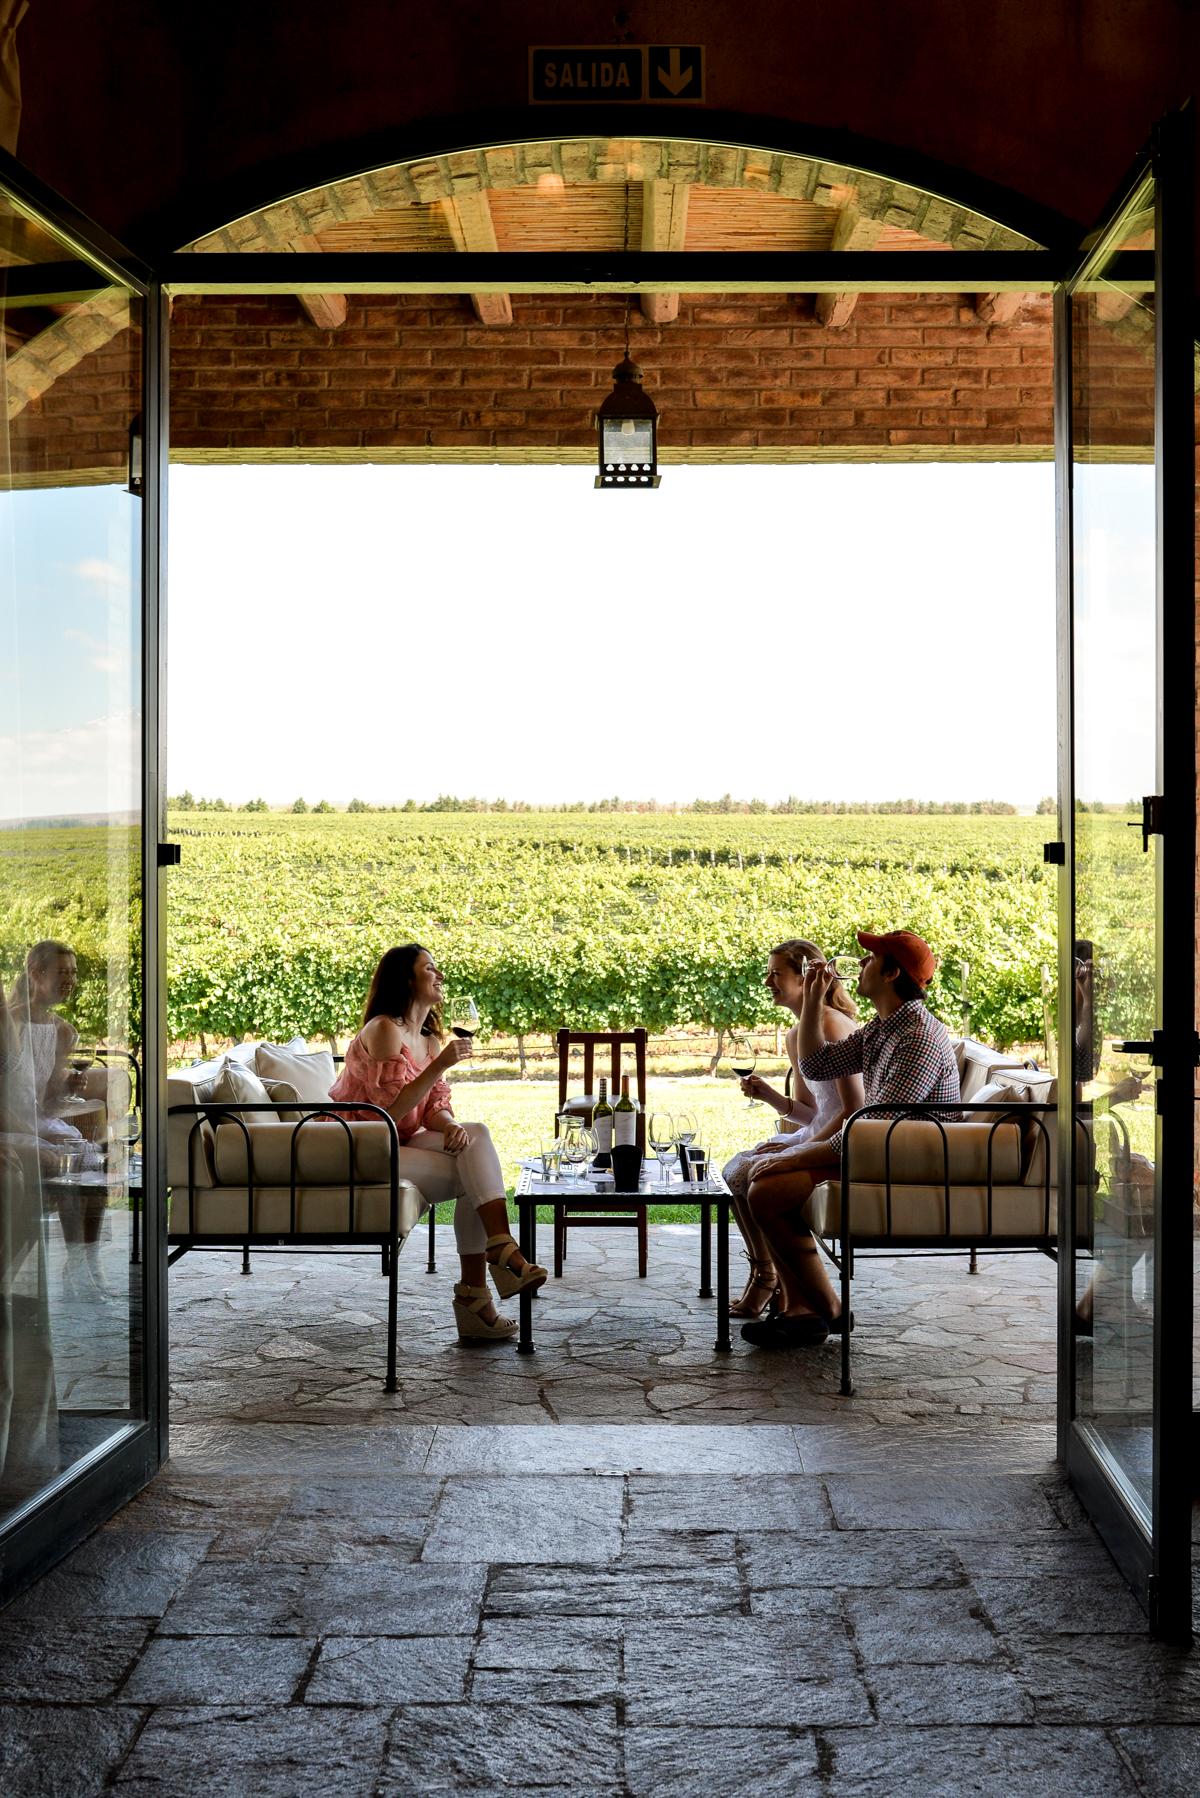 Stacie-Flinner-Best-Mendoza-Winery-8